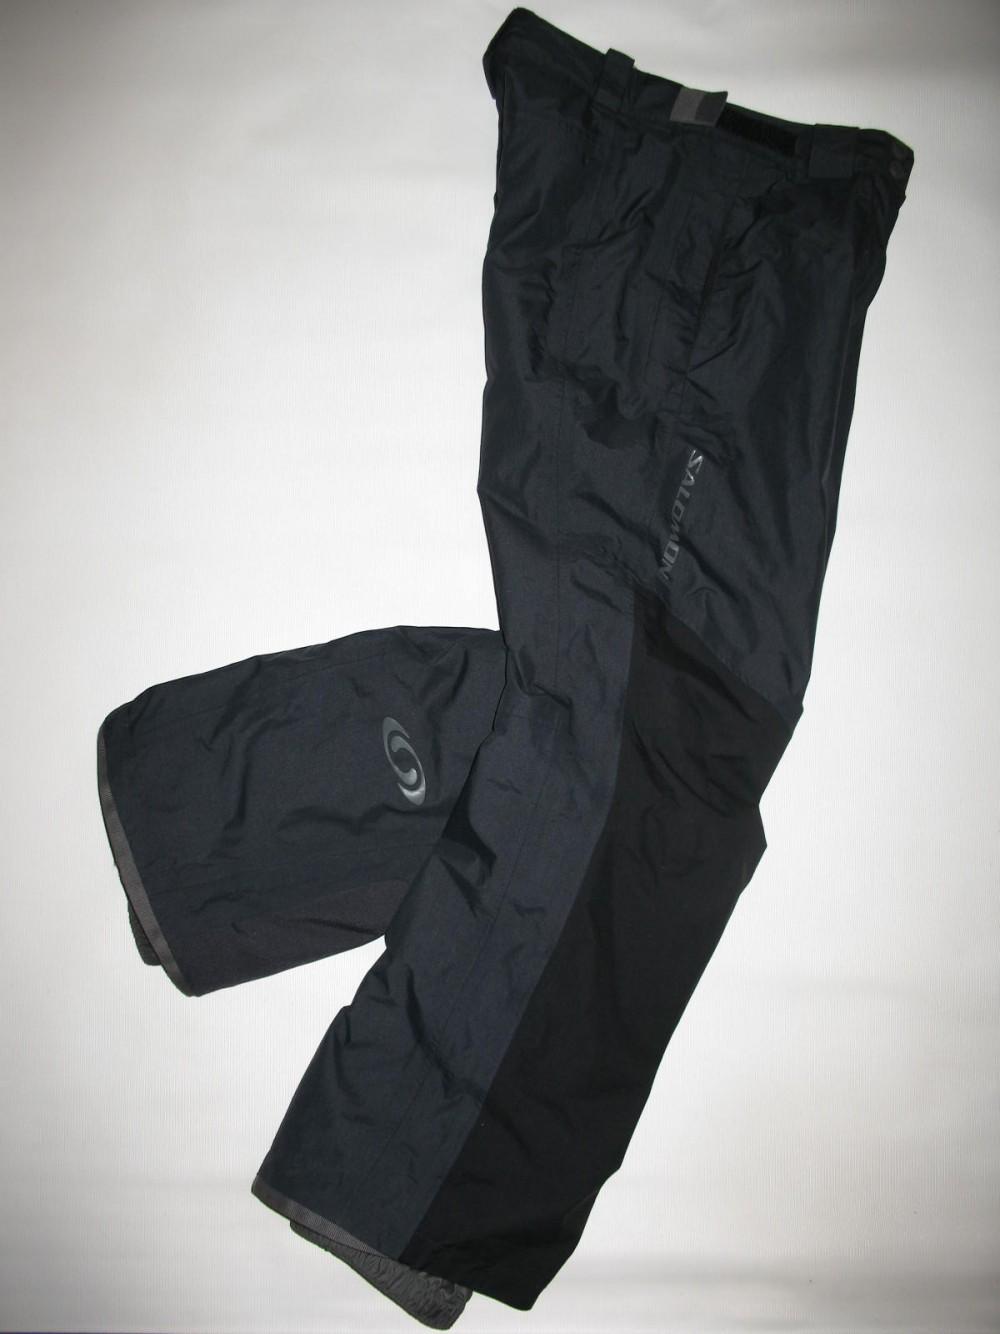 Штаны SALOMON gore-tex ski pants lady (размер 38-M) - 2